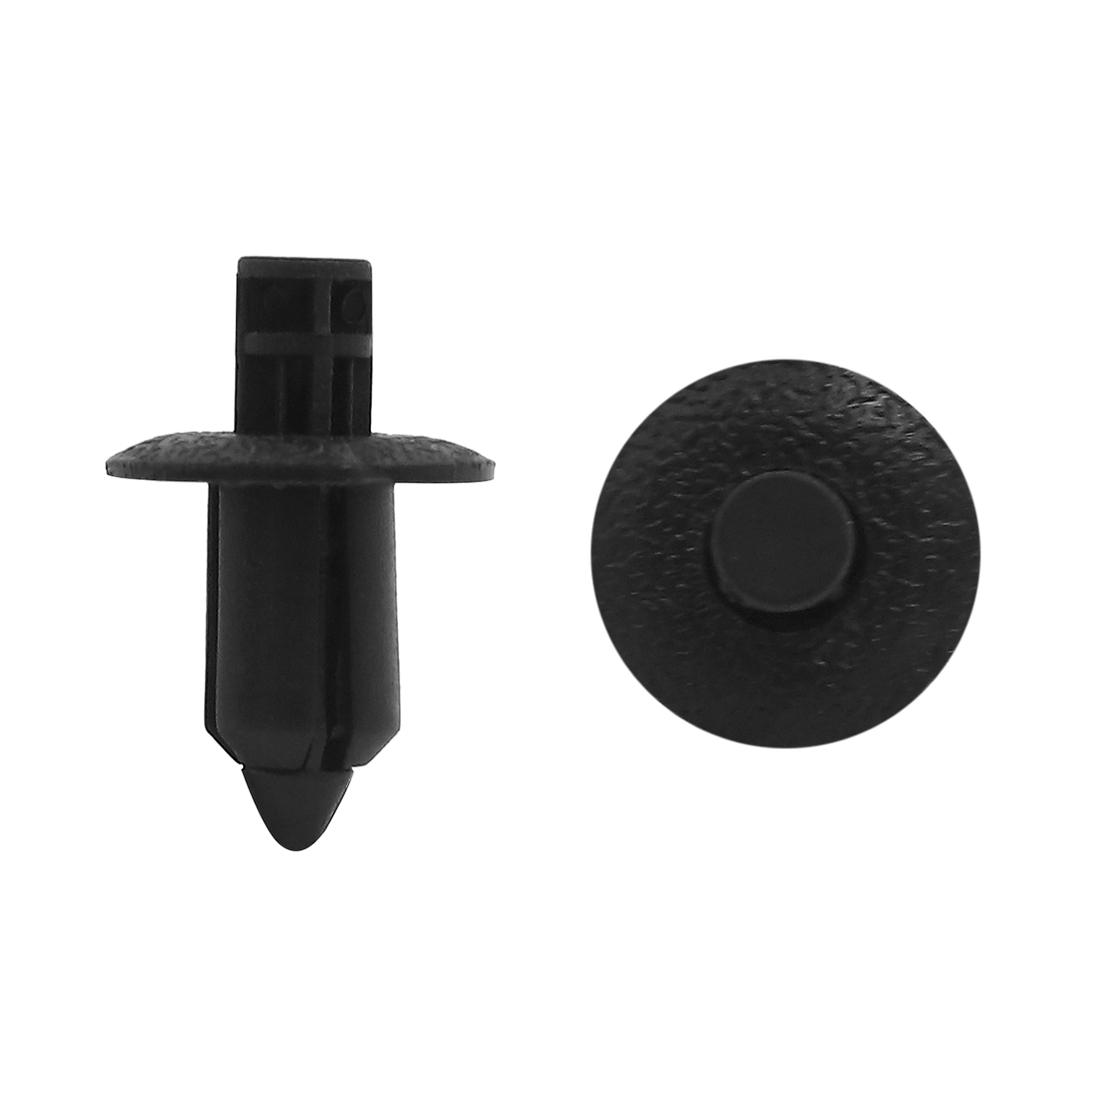 100 Pcs 8mm Hole Dia 17mm Head Plastic Rivets Fastener Push Clips for Car